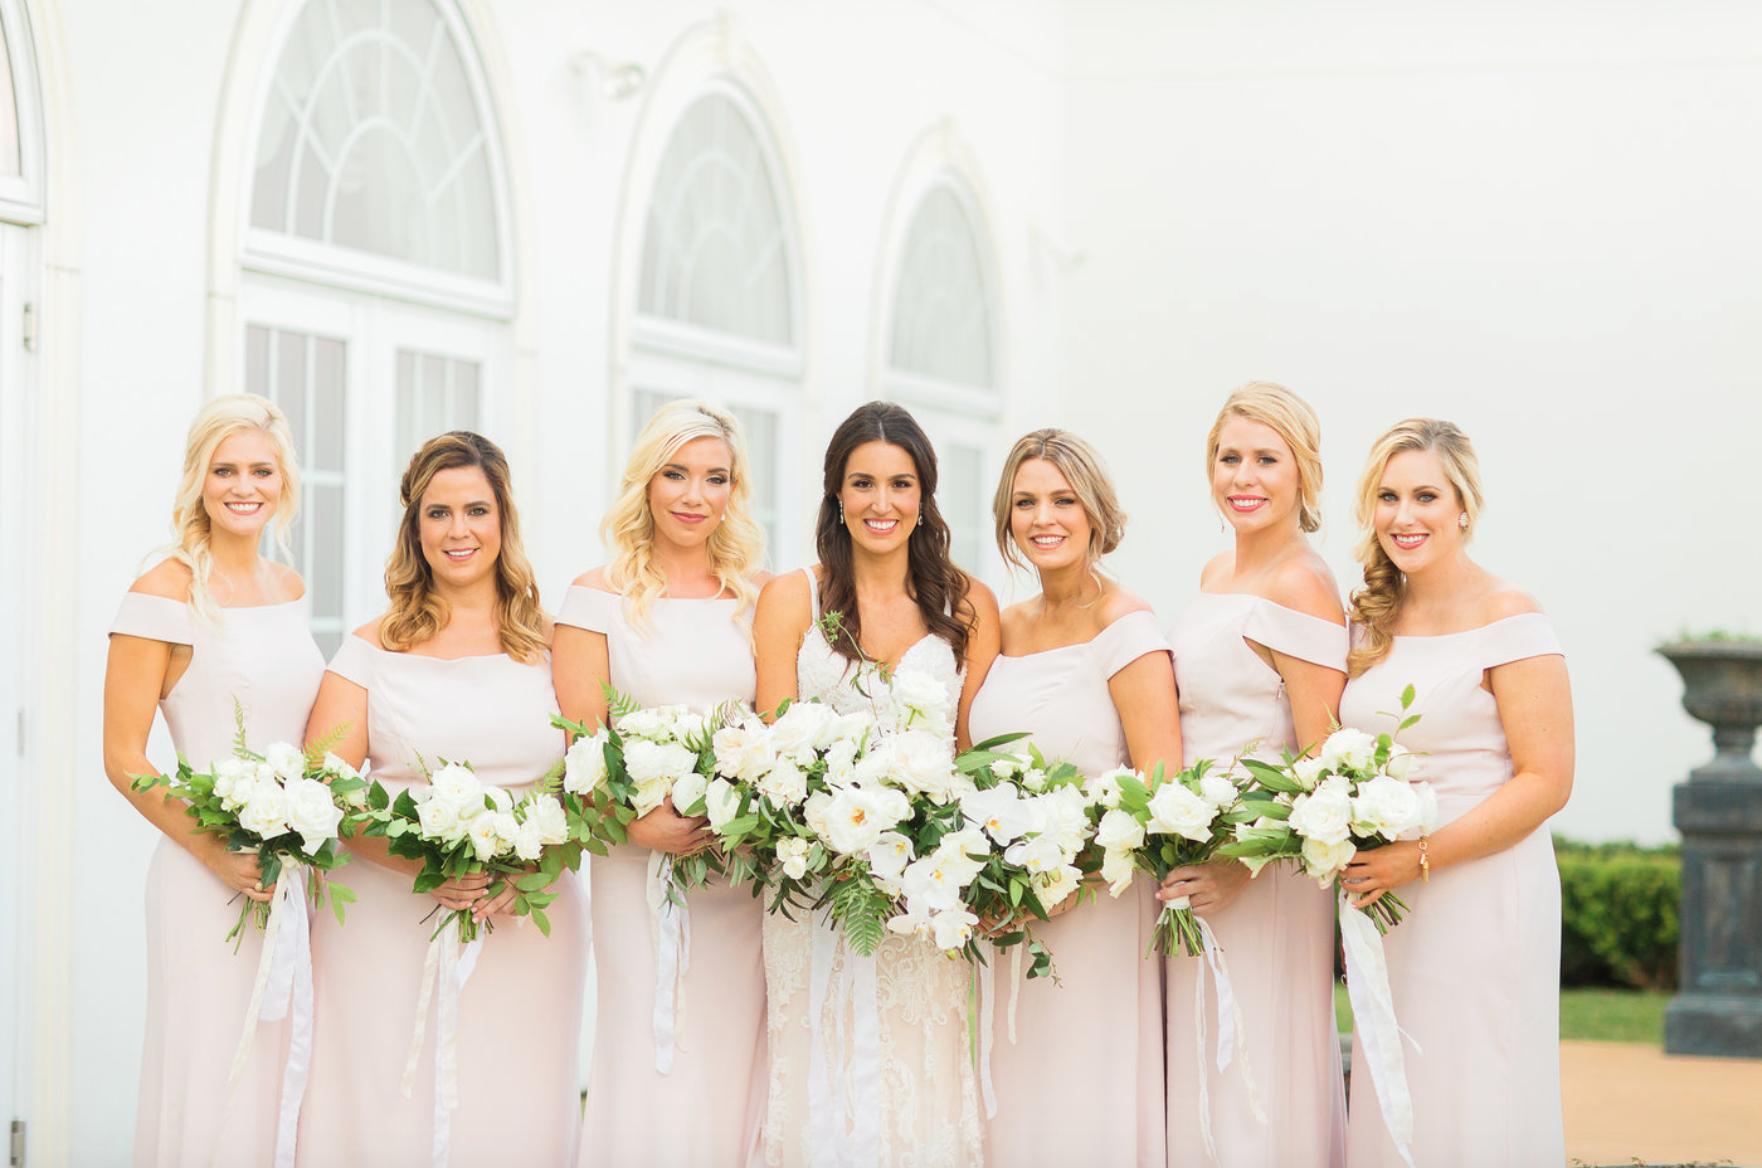 bridesmaids-bride-blush-white-greenery-hydrangas-florals-by-maxit-flower-design-in-houston-texas